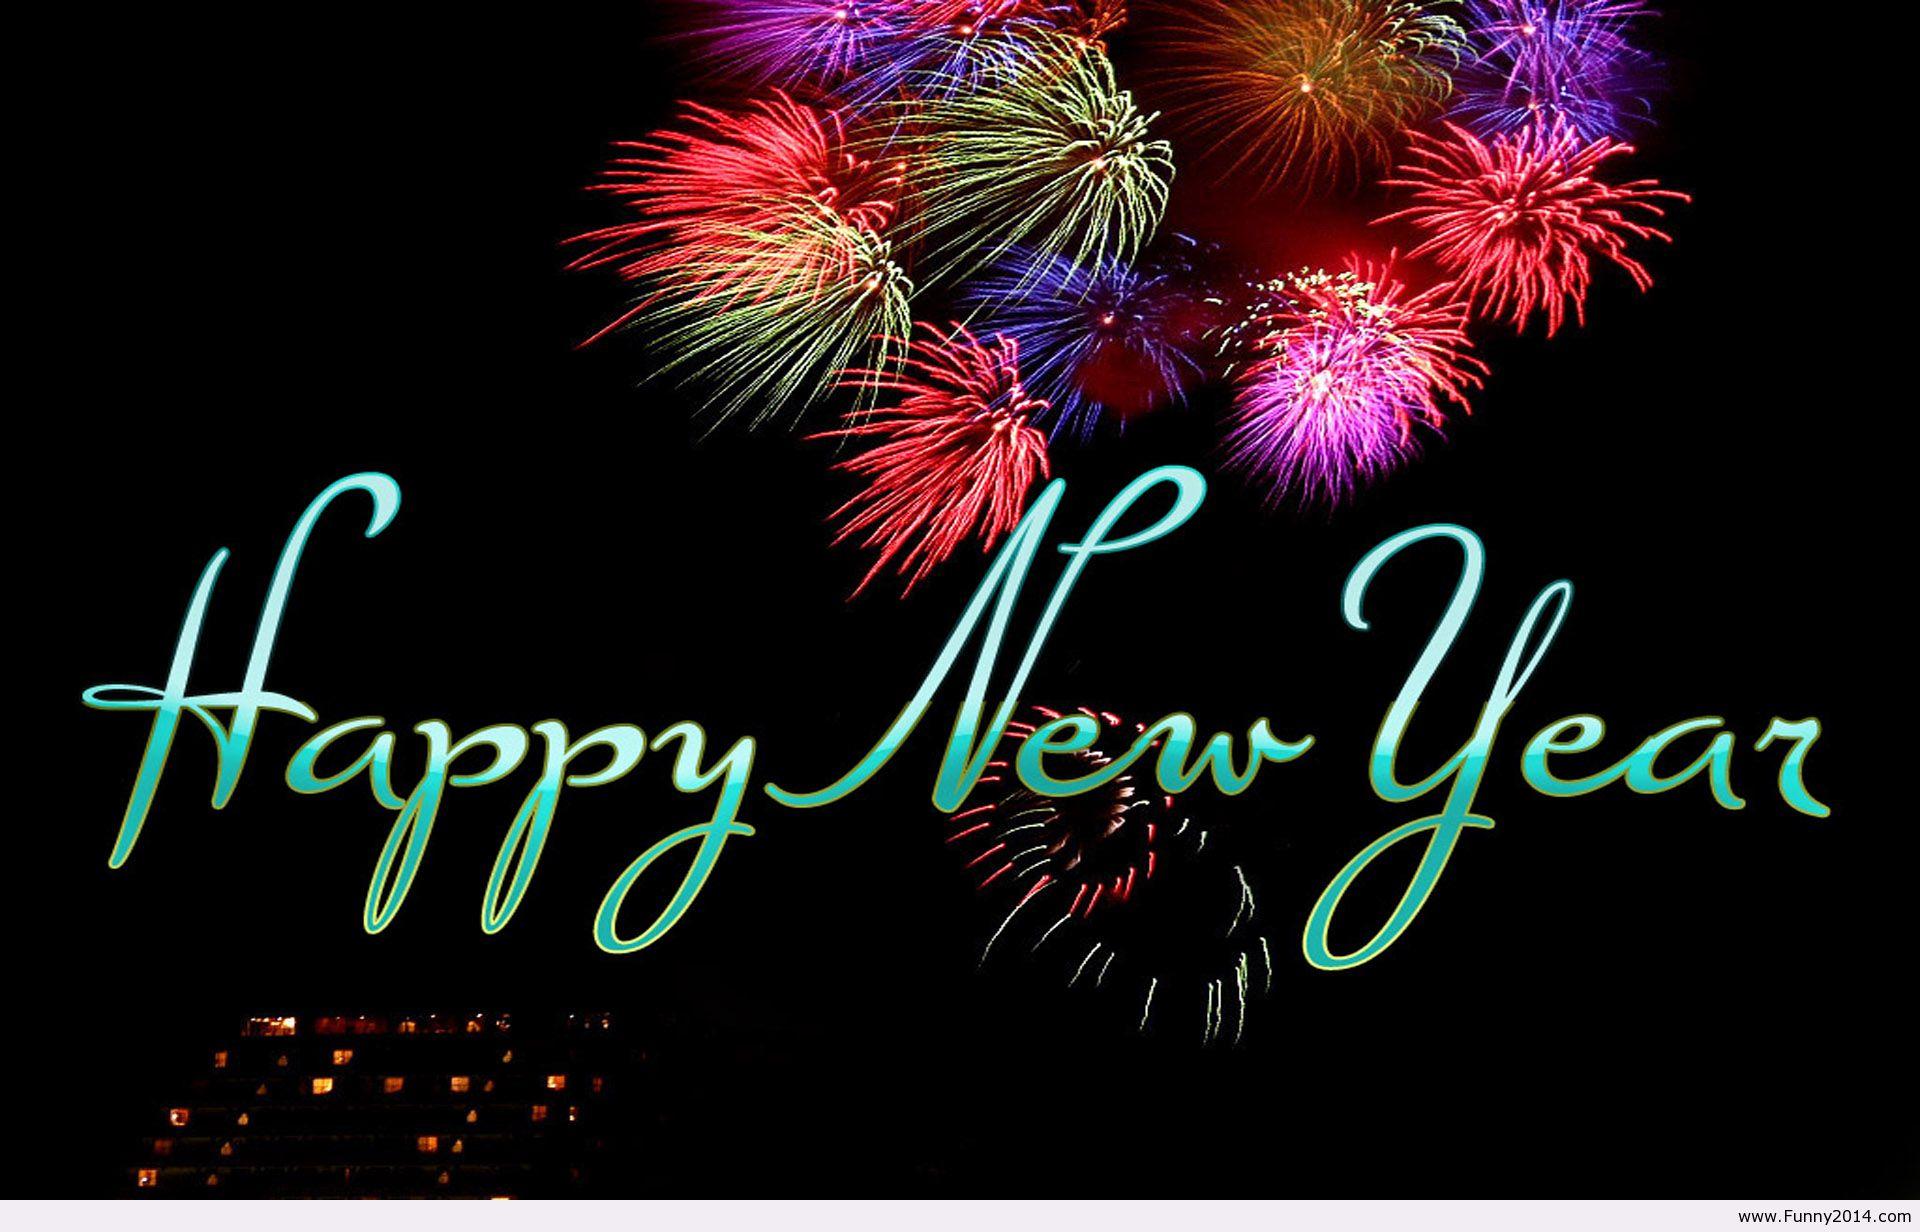 Happy-new-year-2014-free